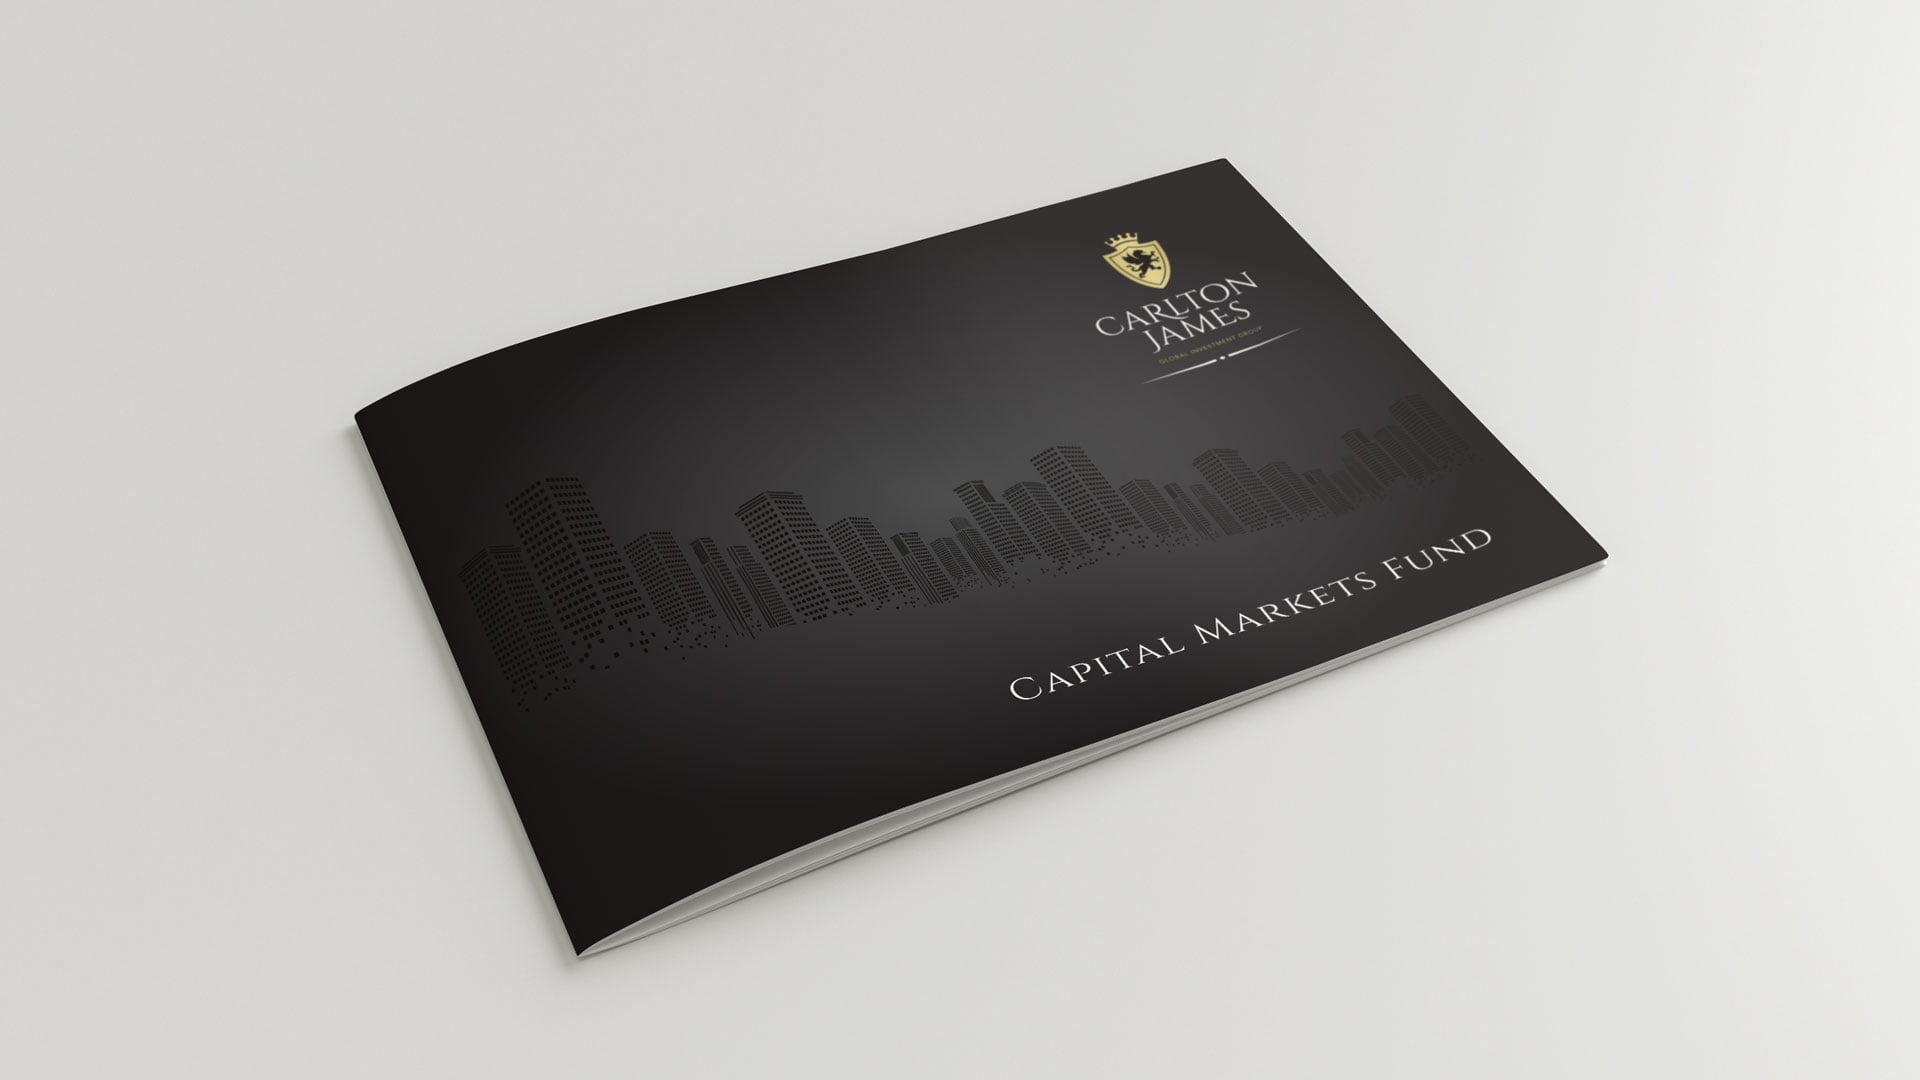 Carlton James - Capital Markets Fund Brochure